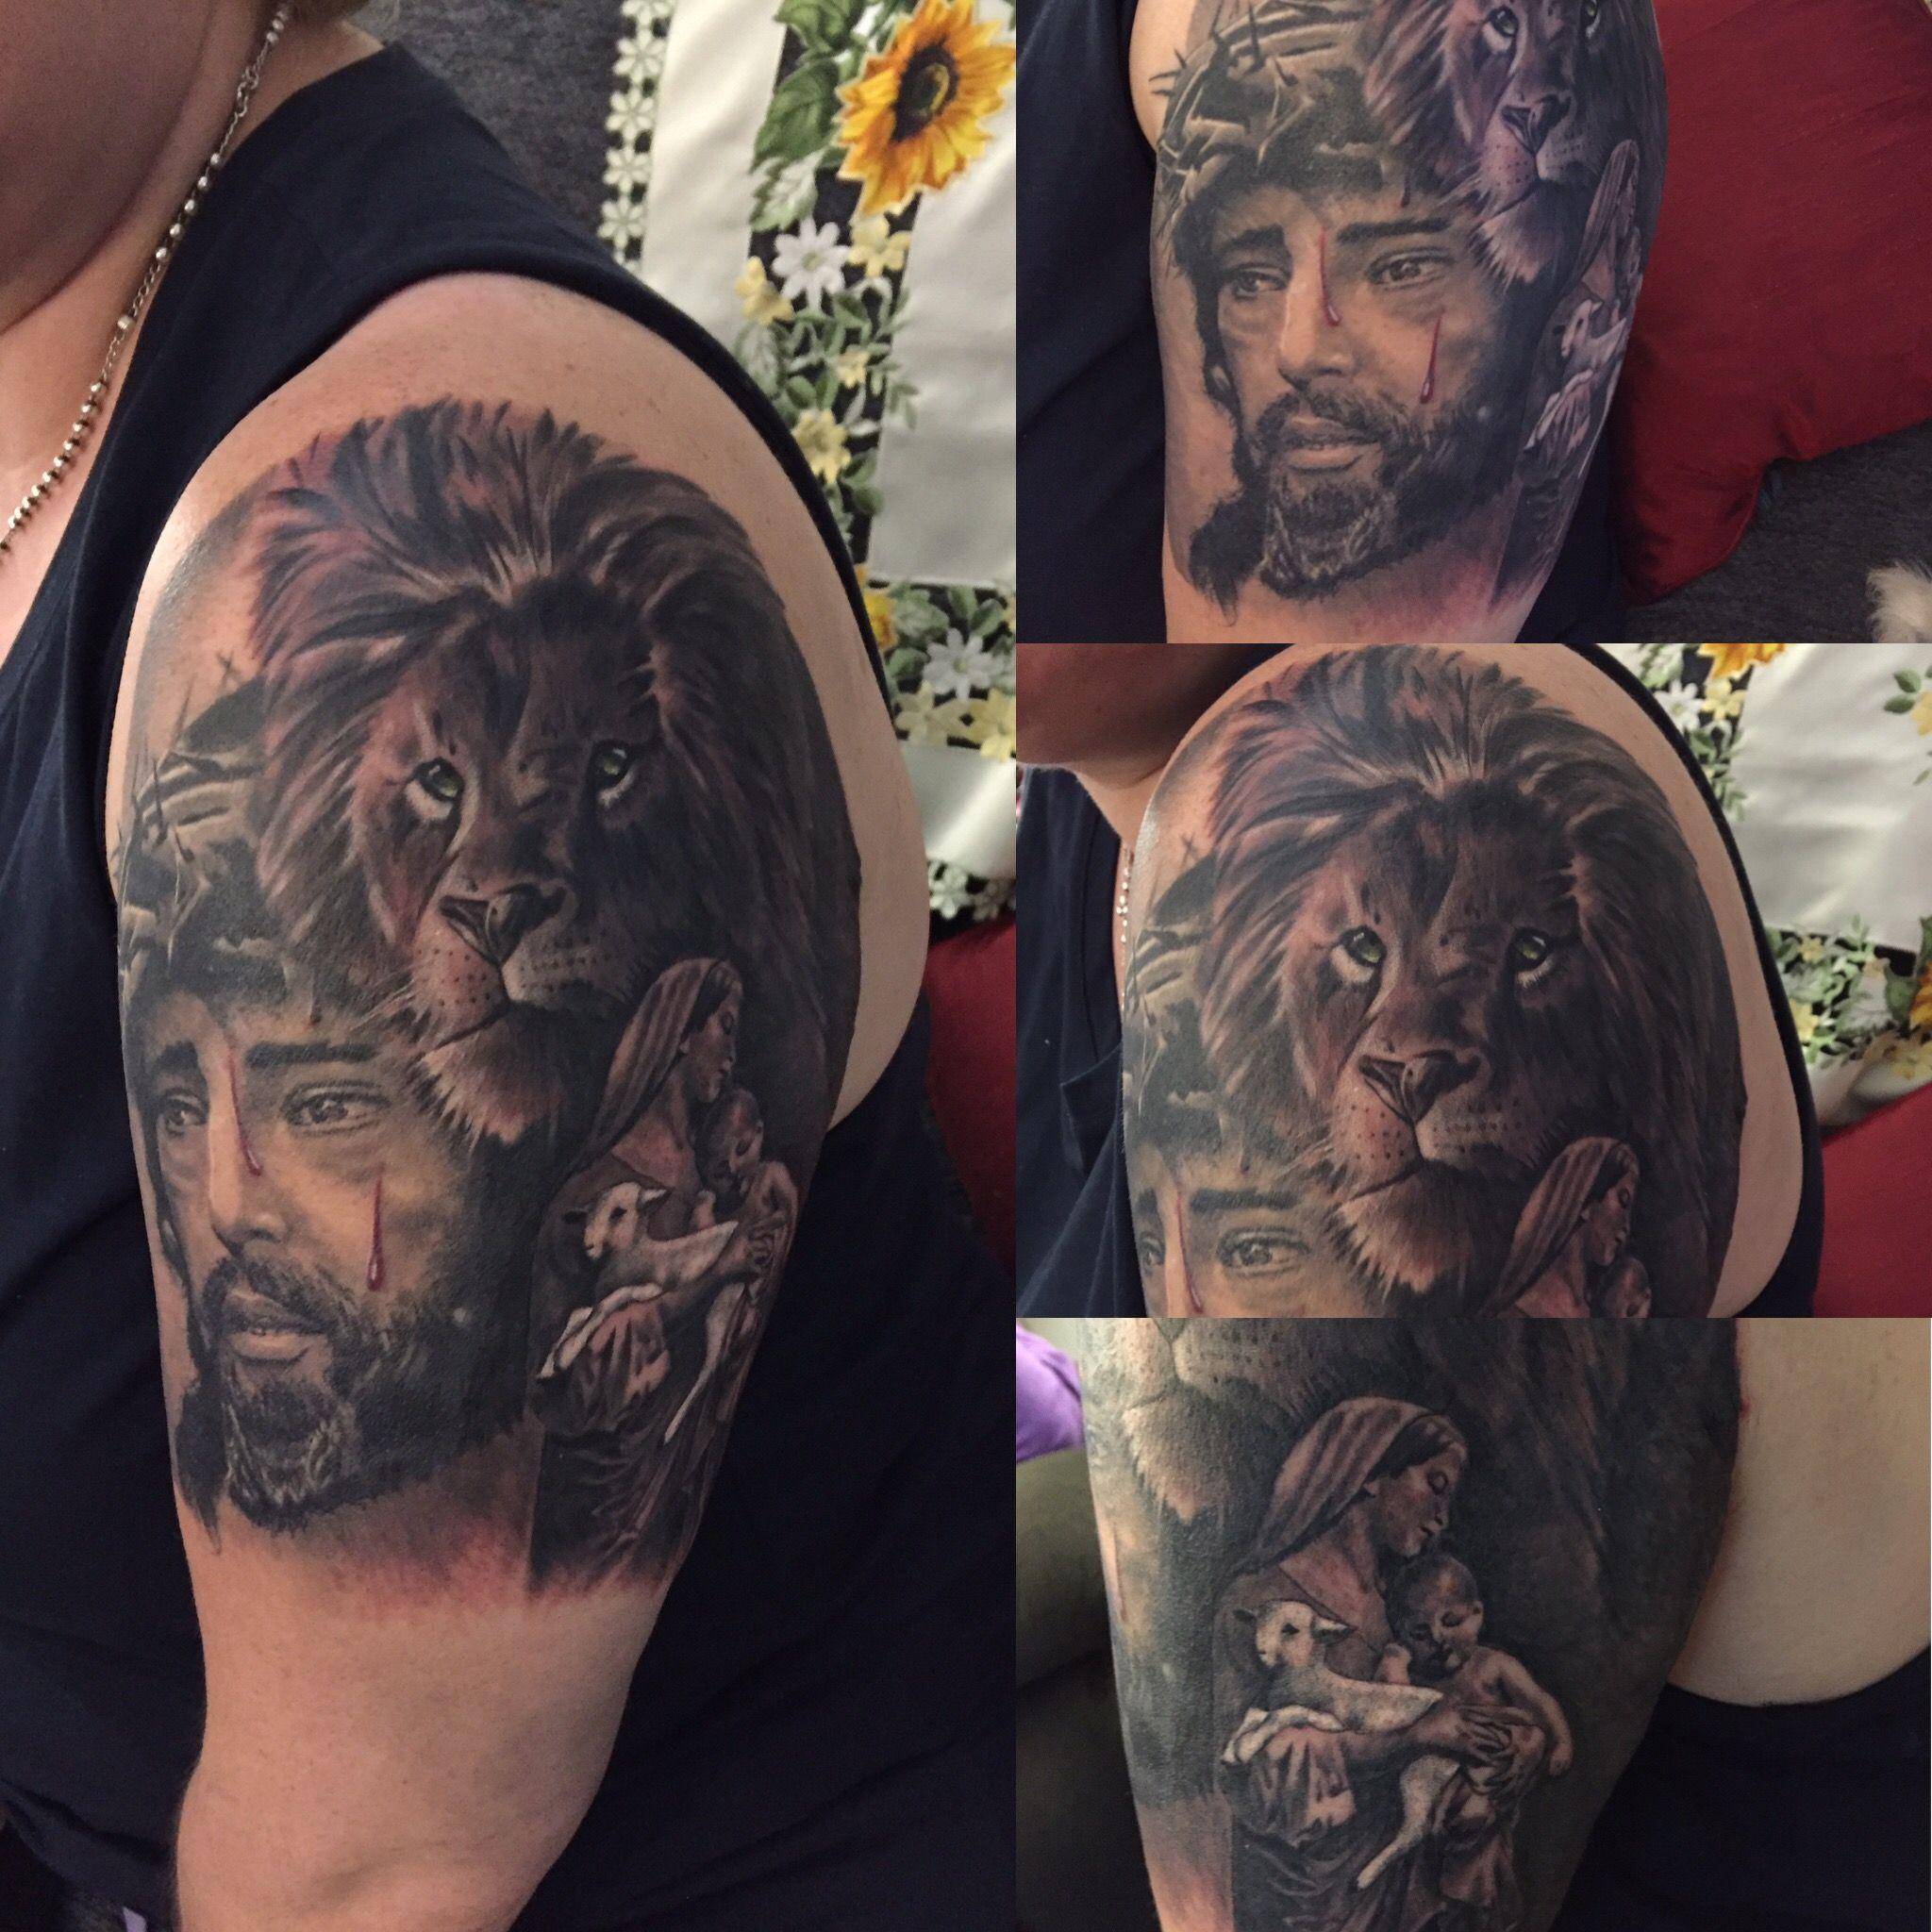 Tattoo Lion Of Judah Lamb Of God Jesus Crown Of Thorns Mother